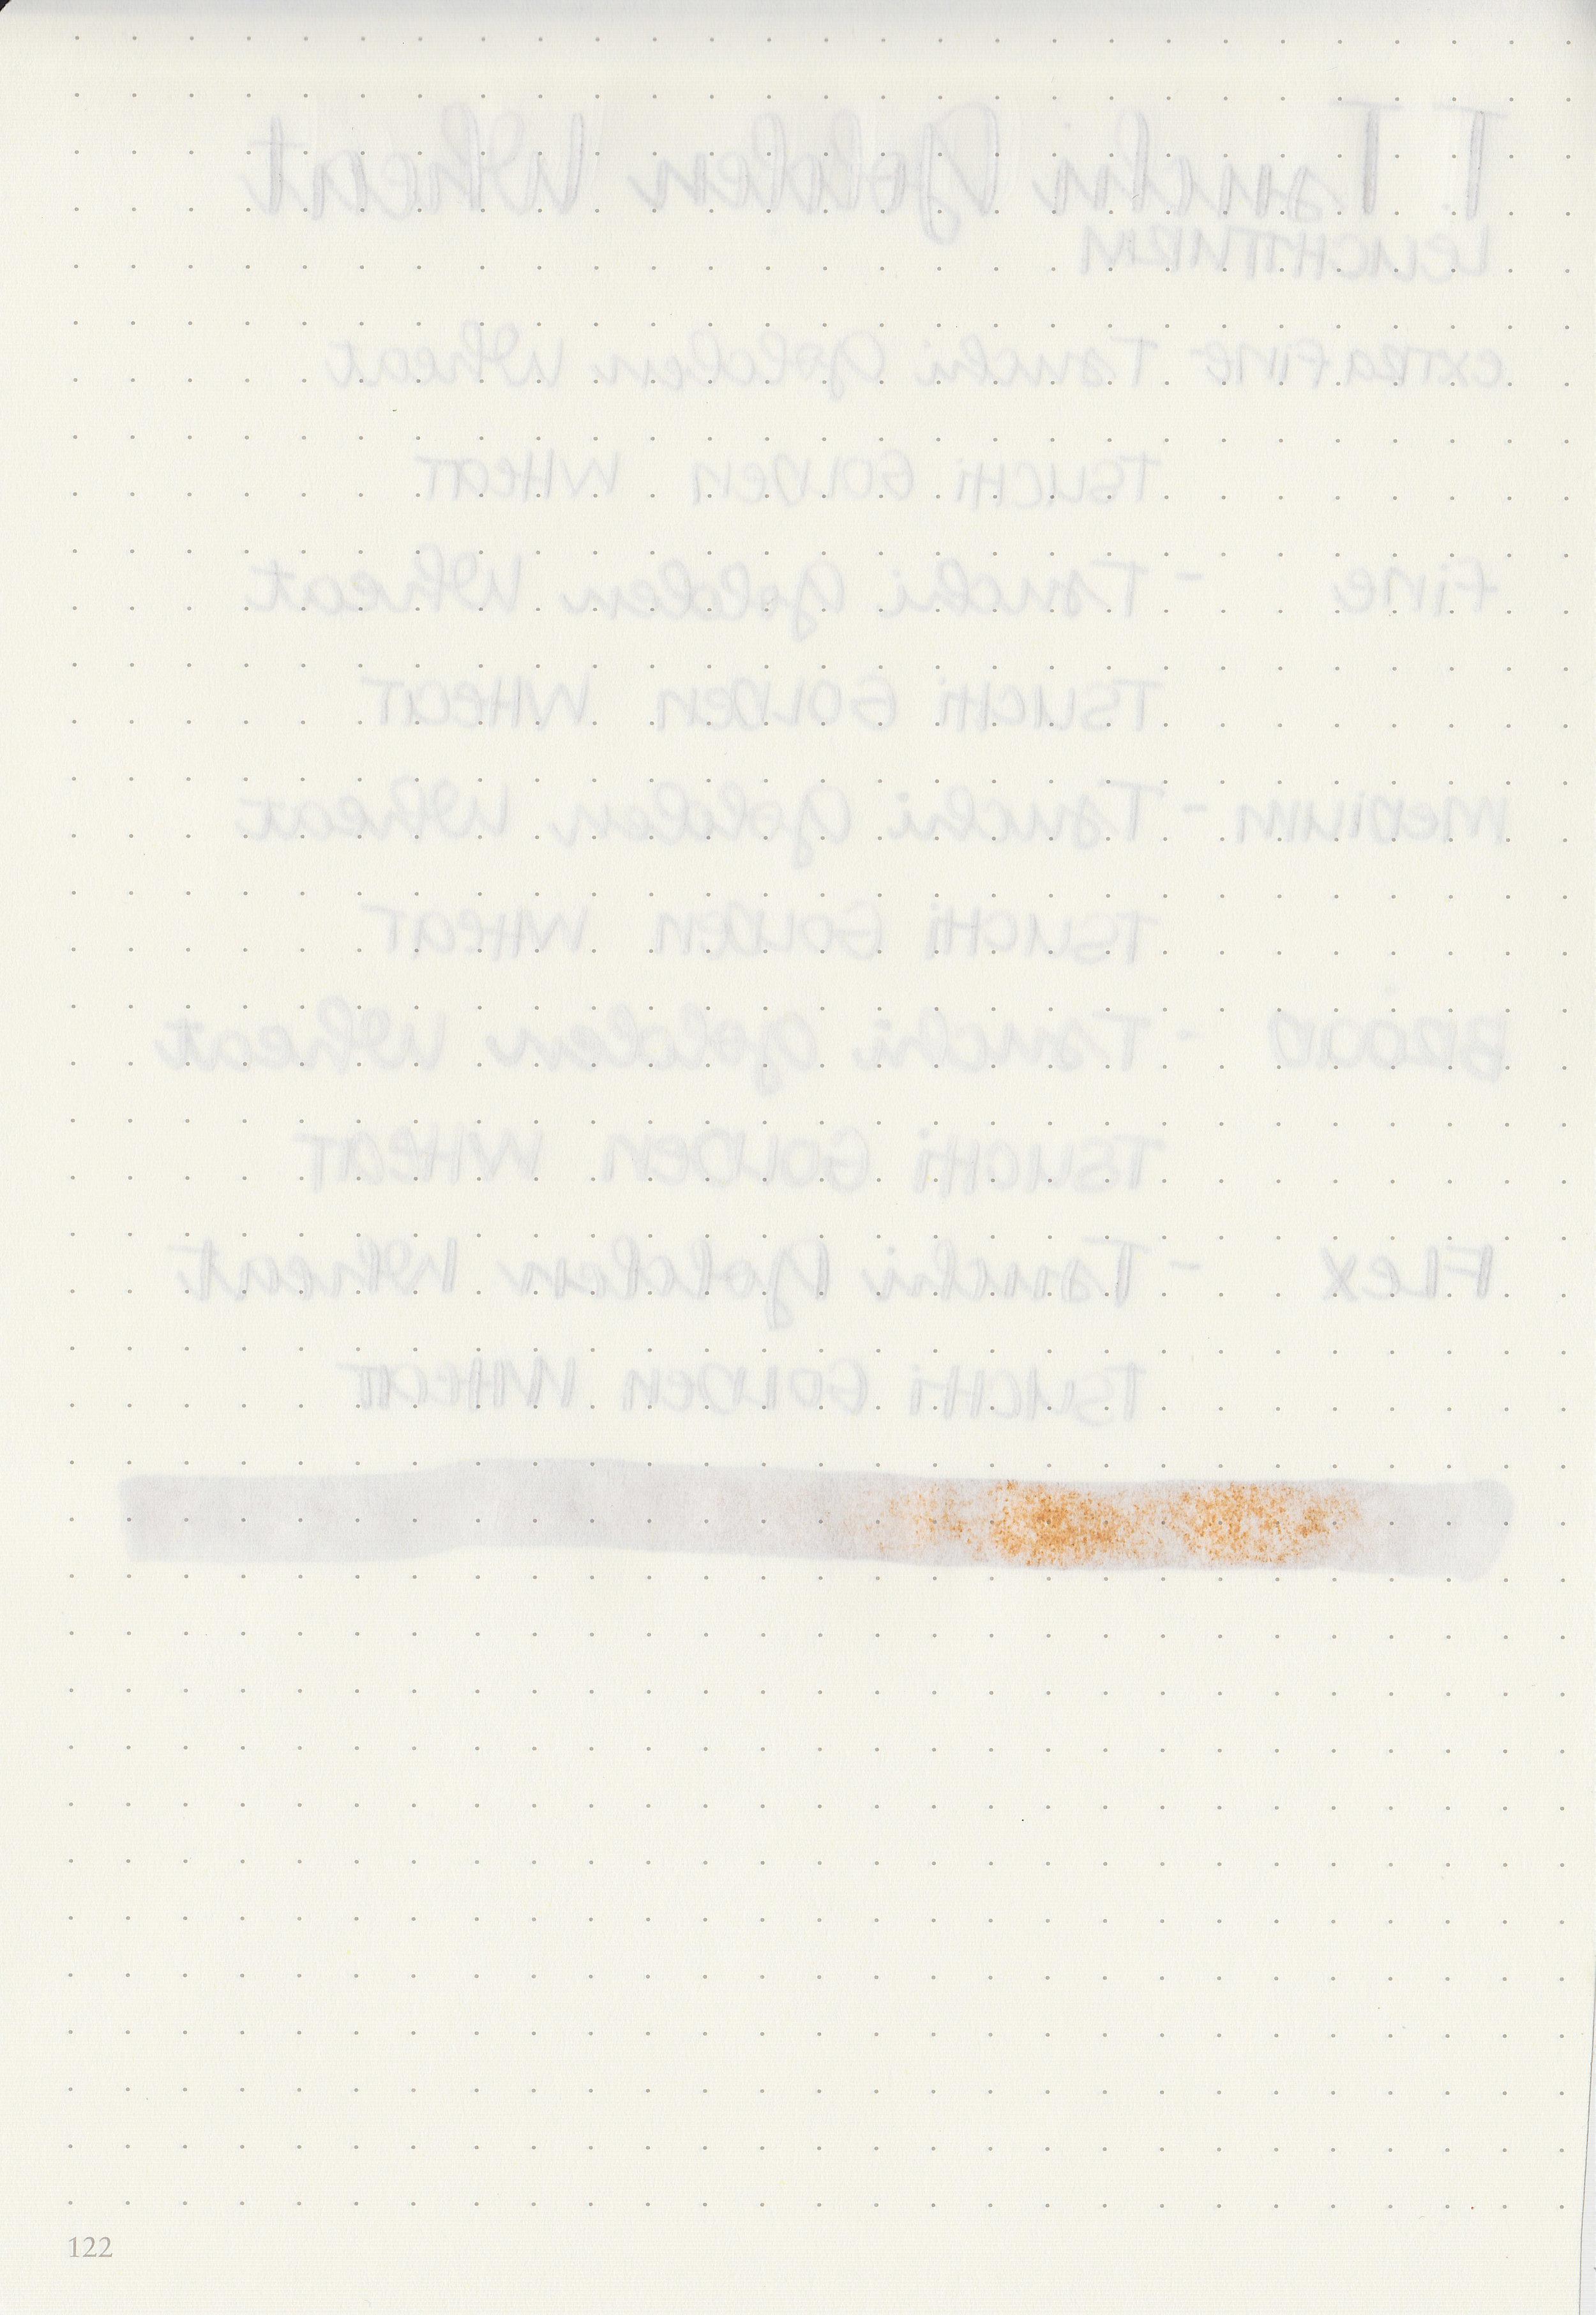 tac-tsuchi-golden-wheat-10.jpg